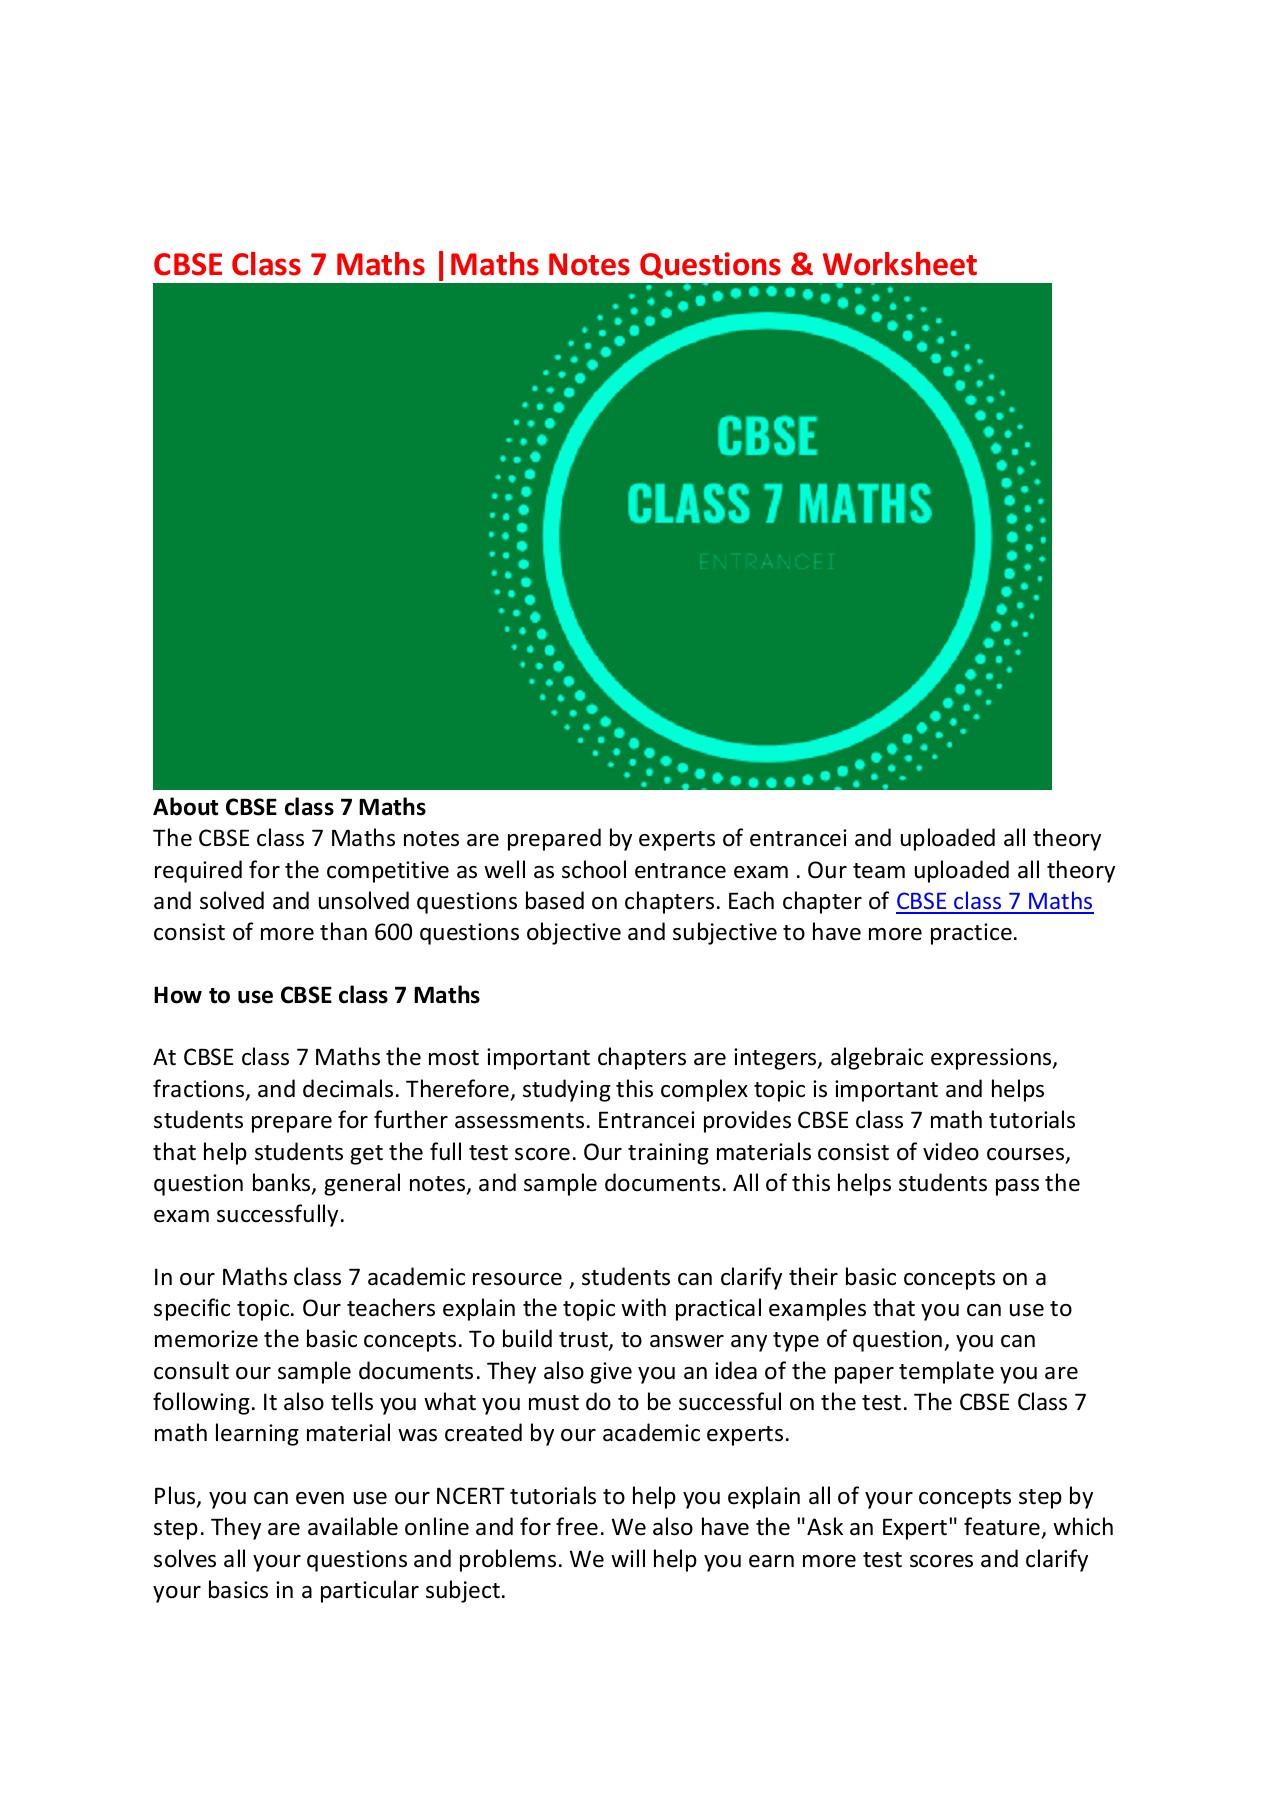 hight resolution of CBSE class 7 Maths Pages 1 - 2 - Flip PDF Download   FlipHTML5